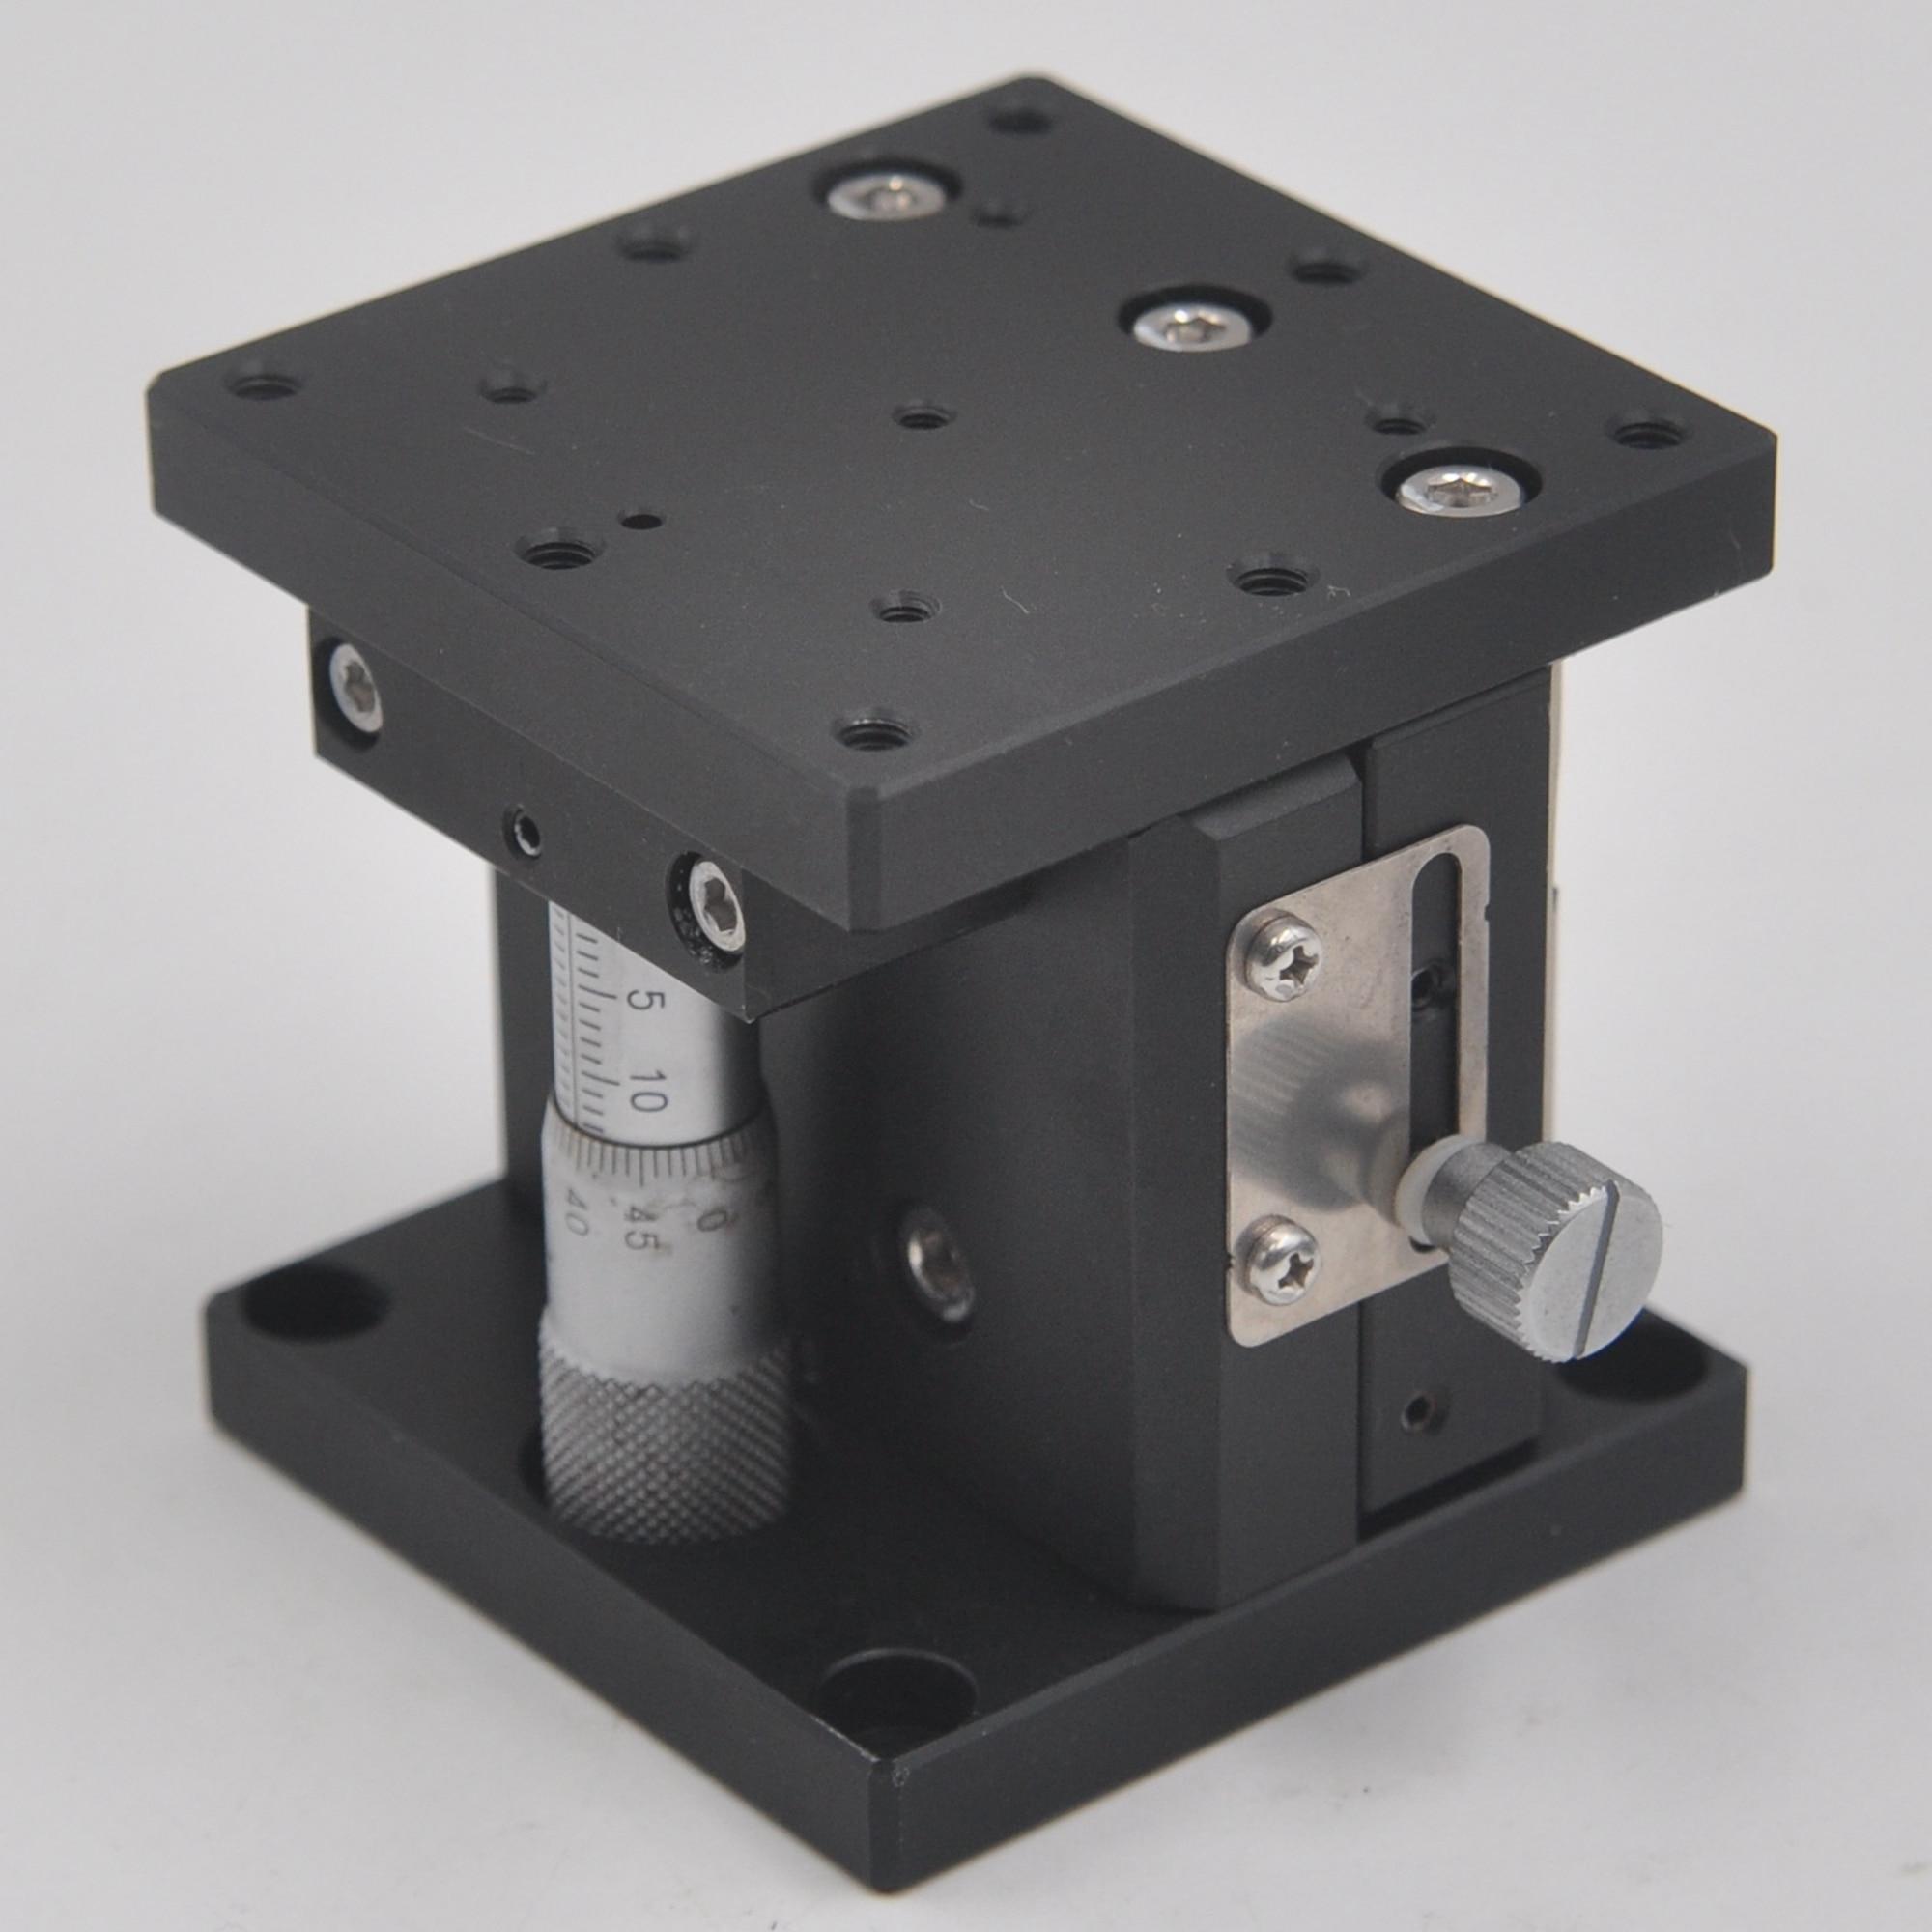 SURUGA B37-60 Z Axis 60 * 60mm Manual Precision Lifting Fine Adjustment Slide Optical Displacement Platform Aluminum